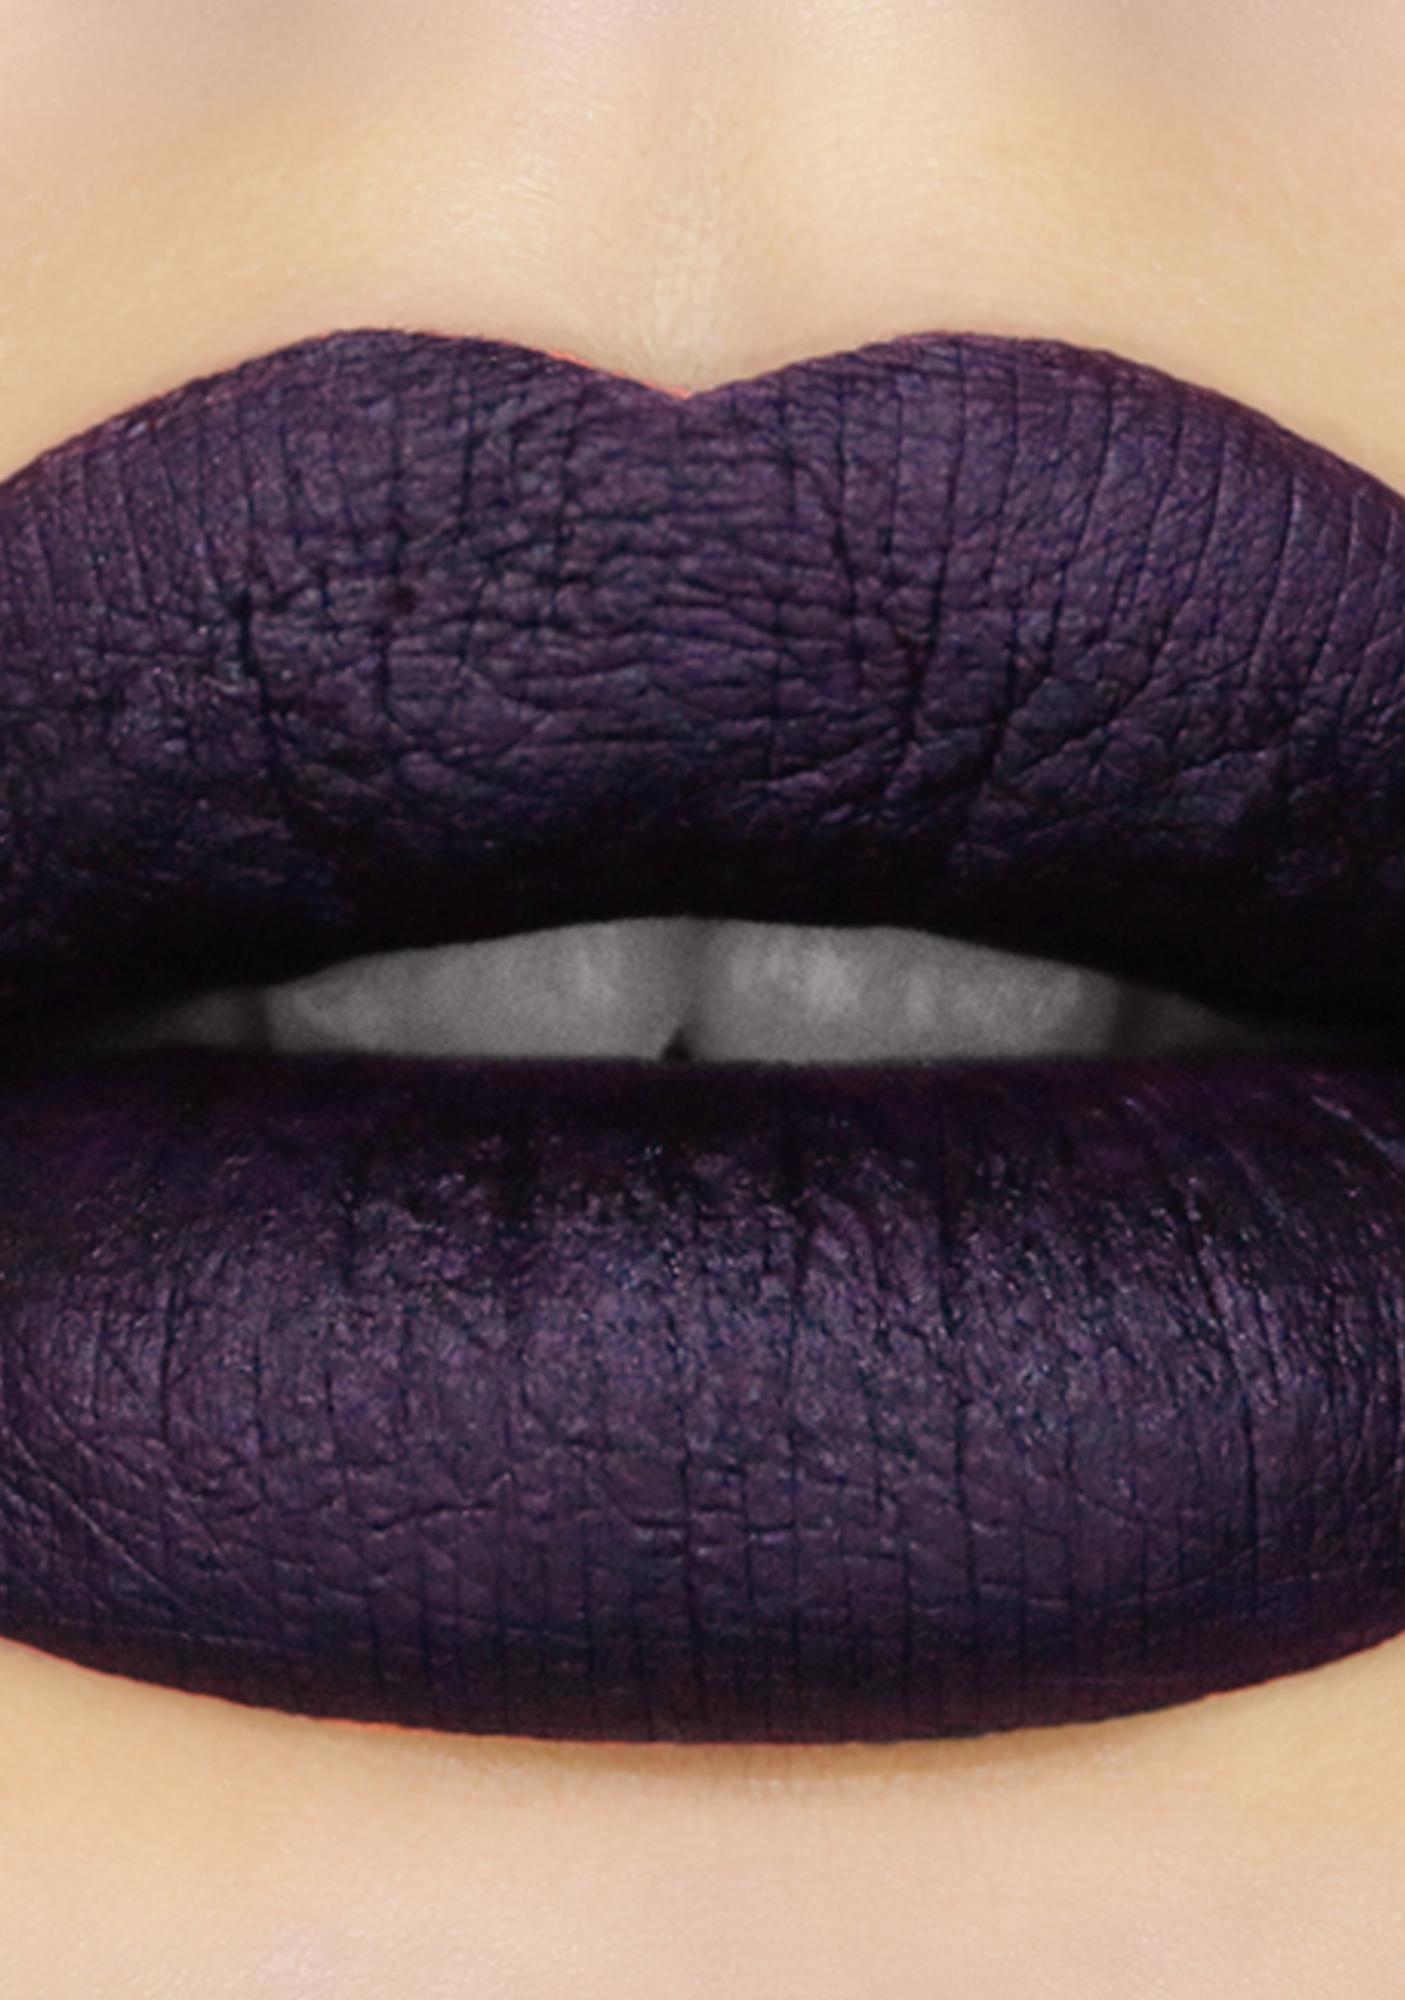 Sugarpill Dark Sided Liquid Lipstick